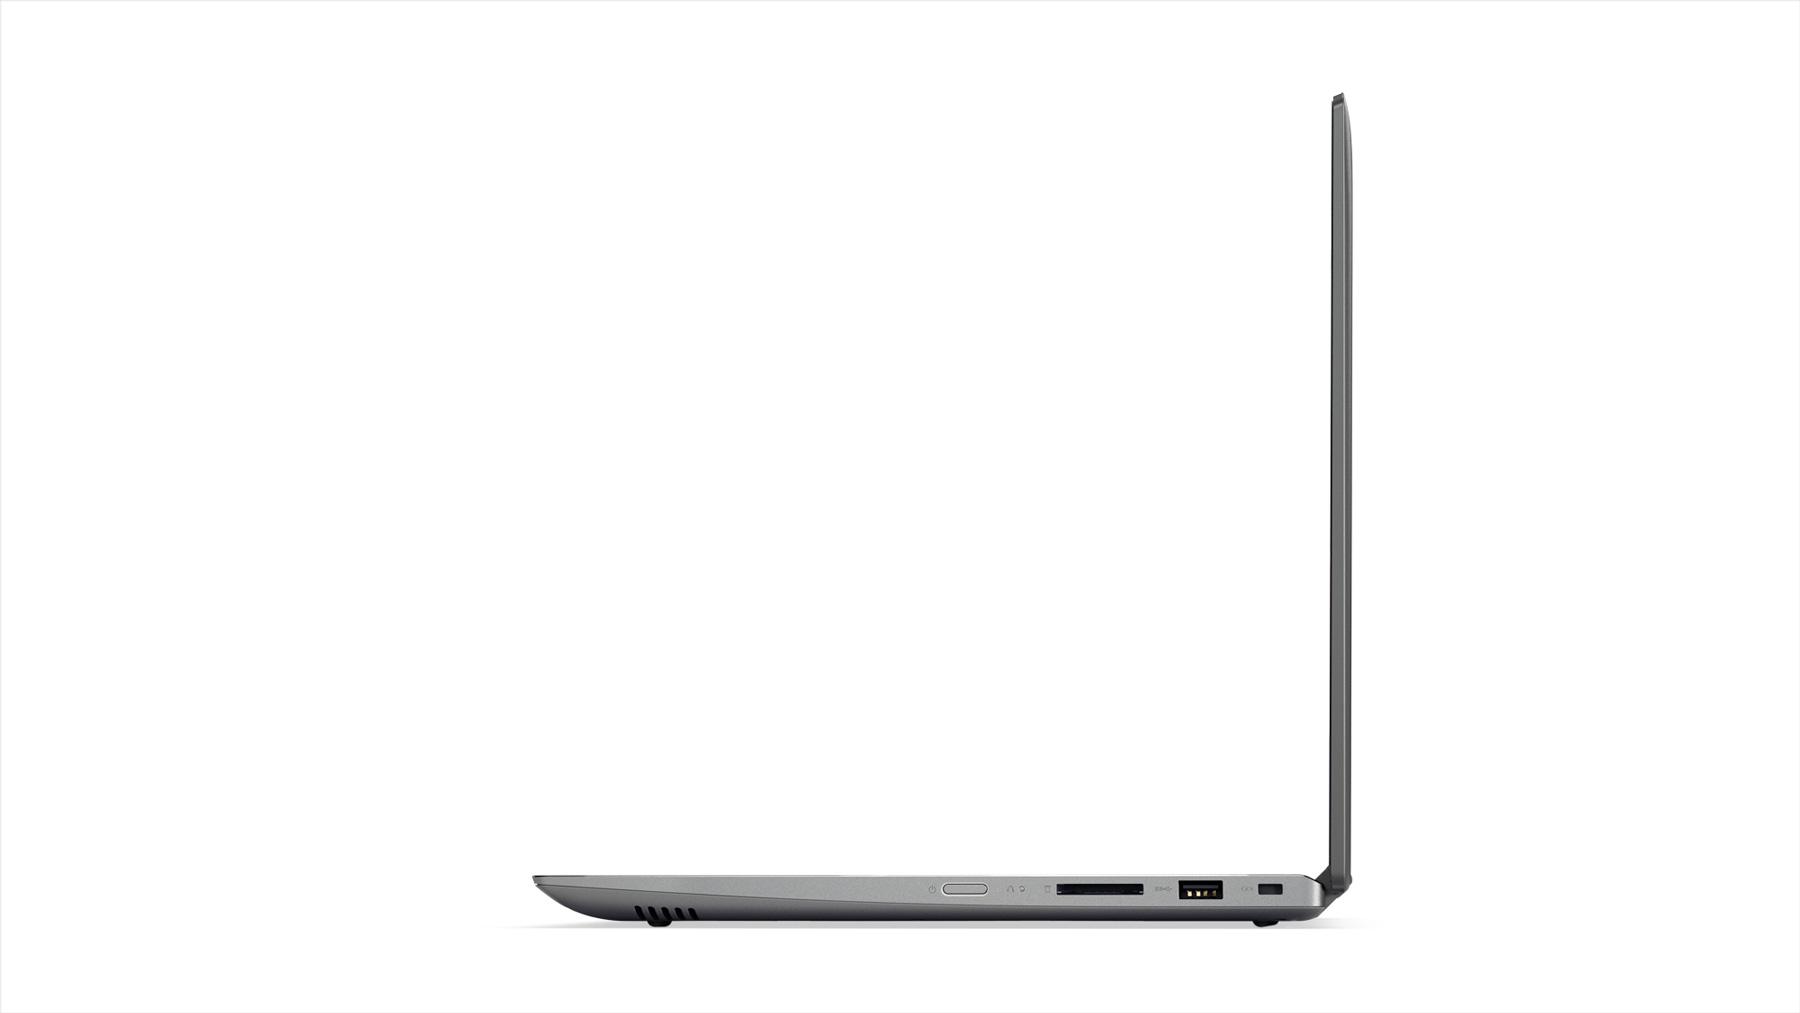 Фото  Ультрабук Lenovo Yoga 520 Mineral Grey (81C800DCRA)